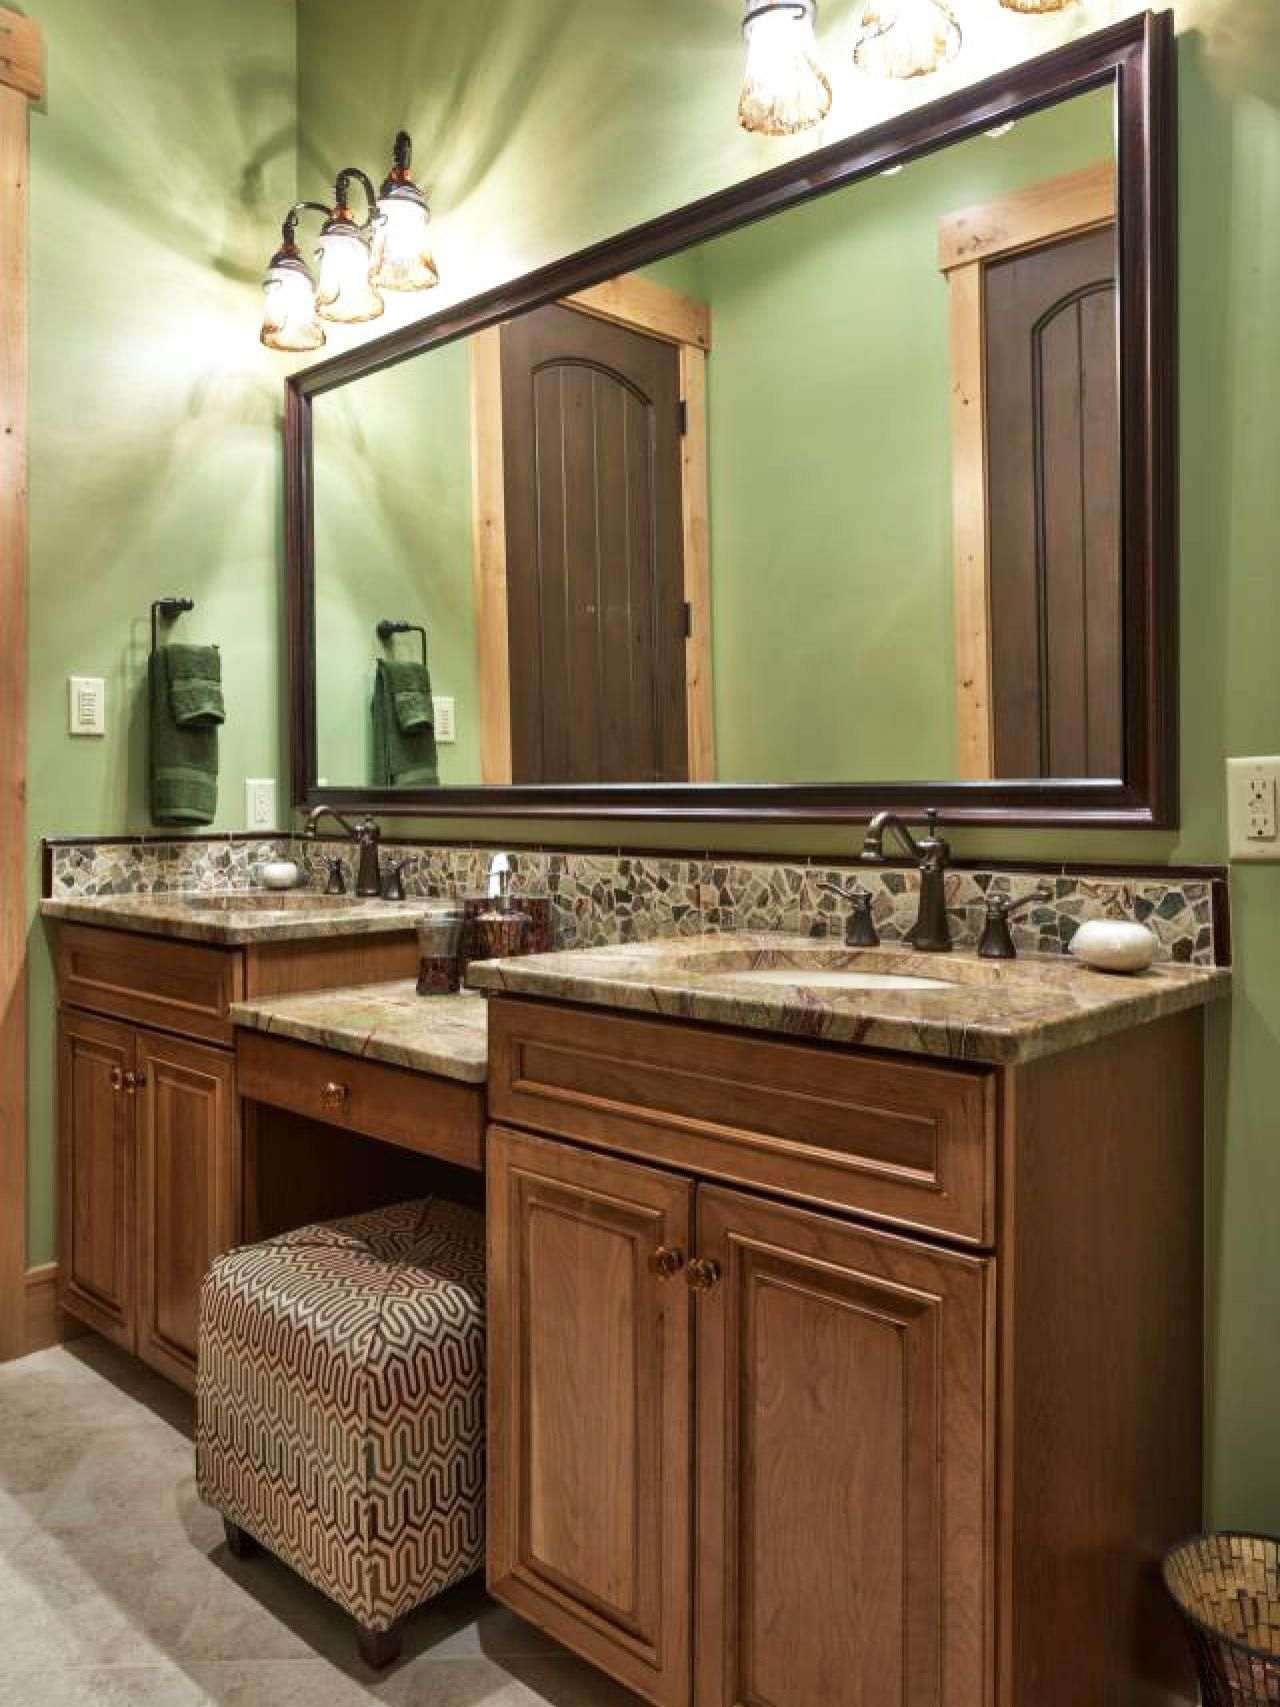 Light Wood Cabinetry Illuminates This Traditional Bathroom